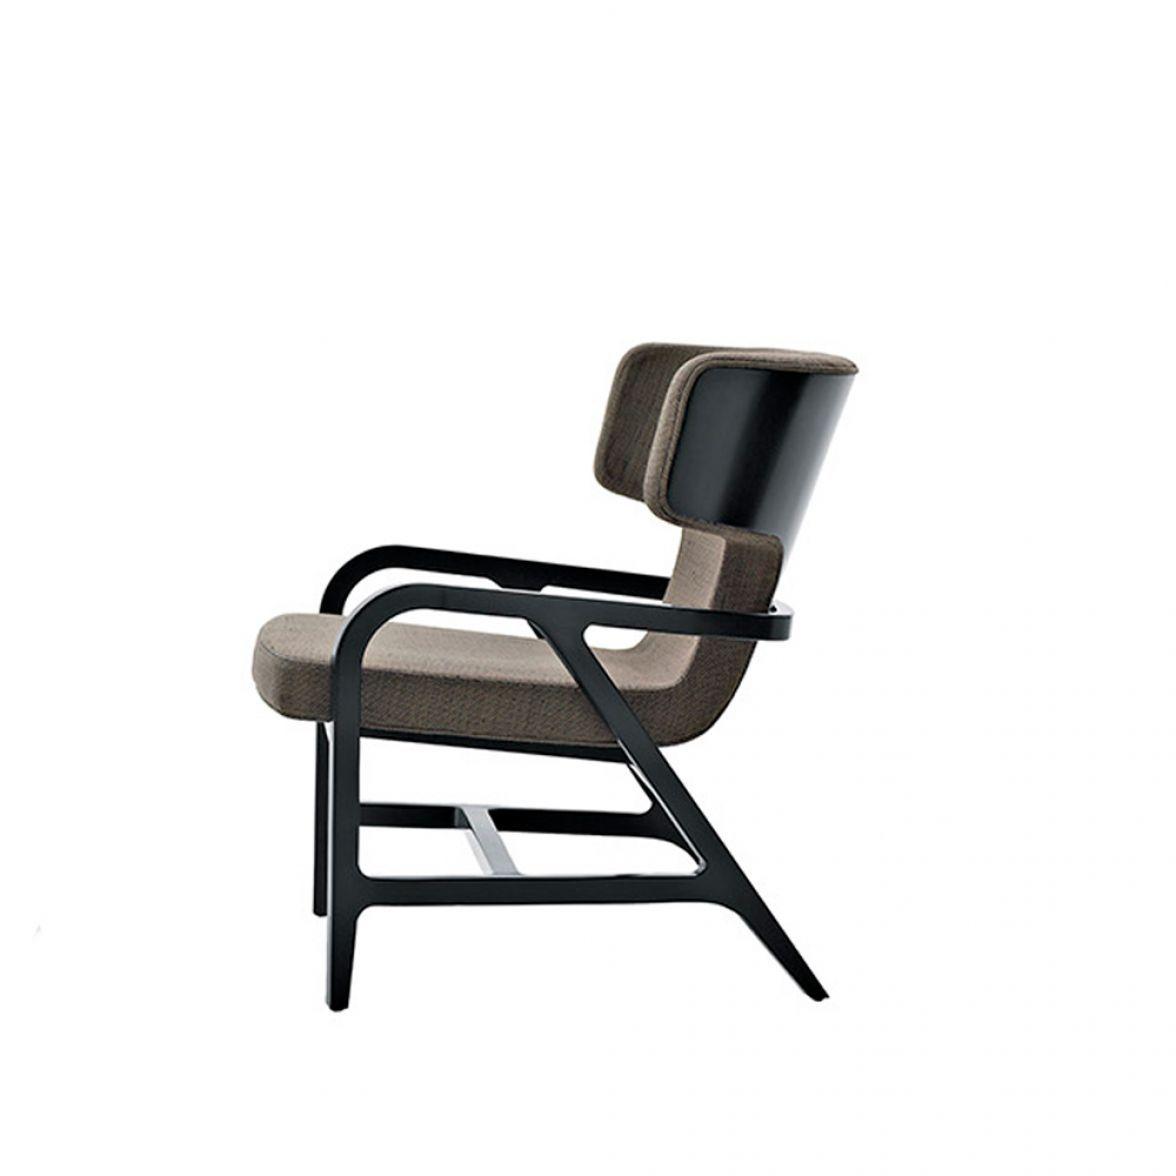 Fulgens armchair